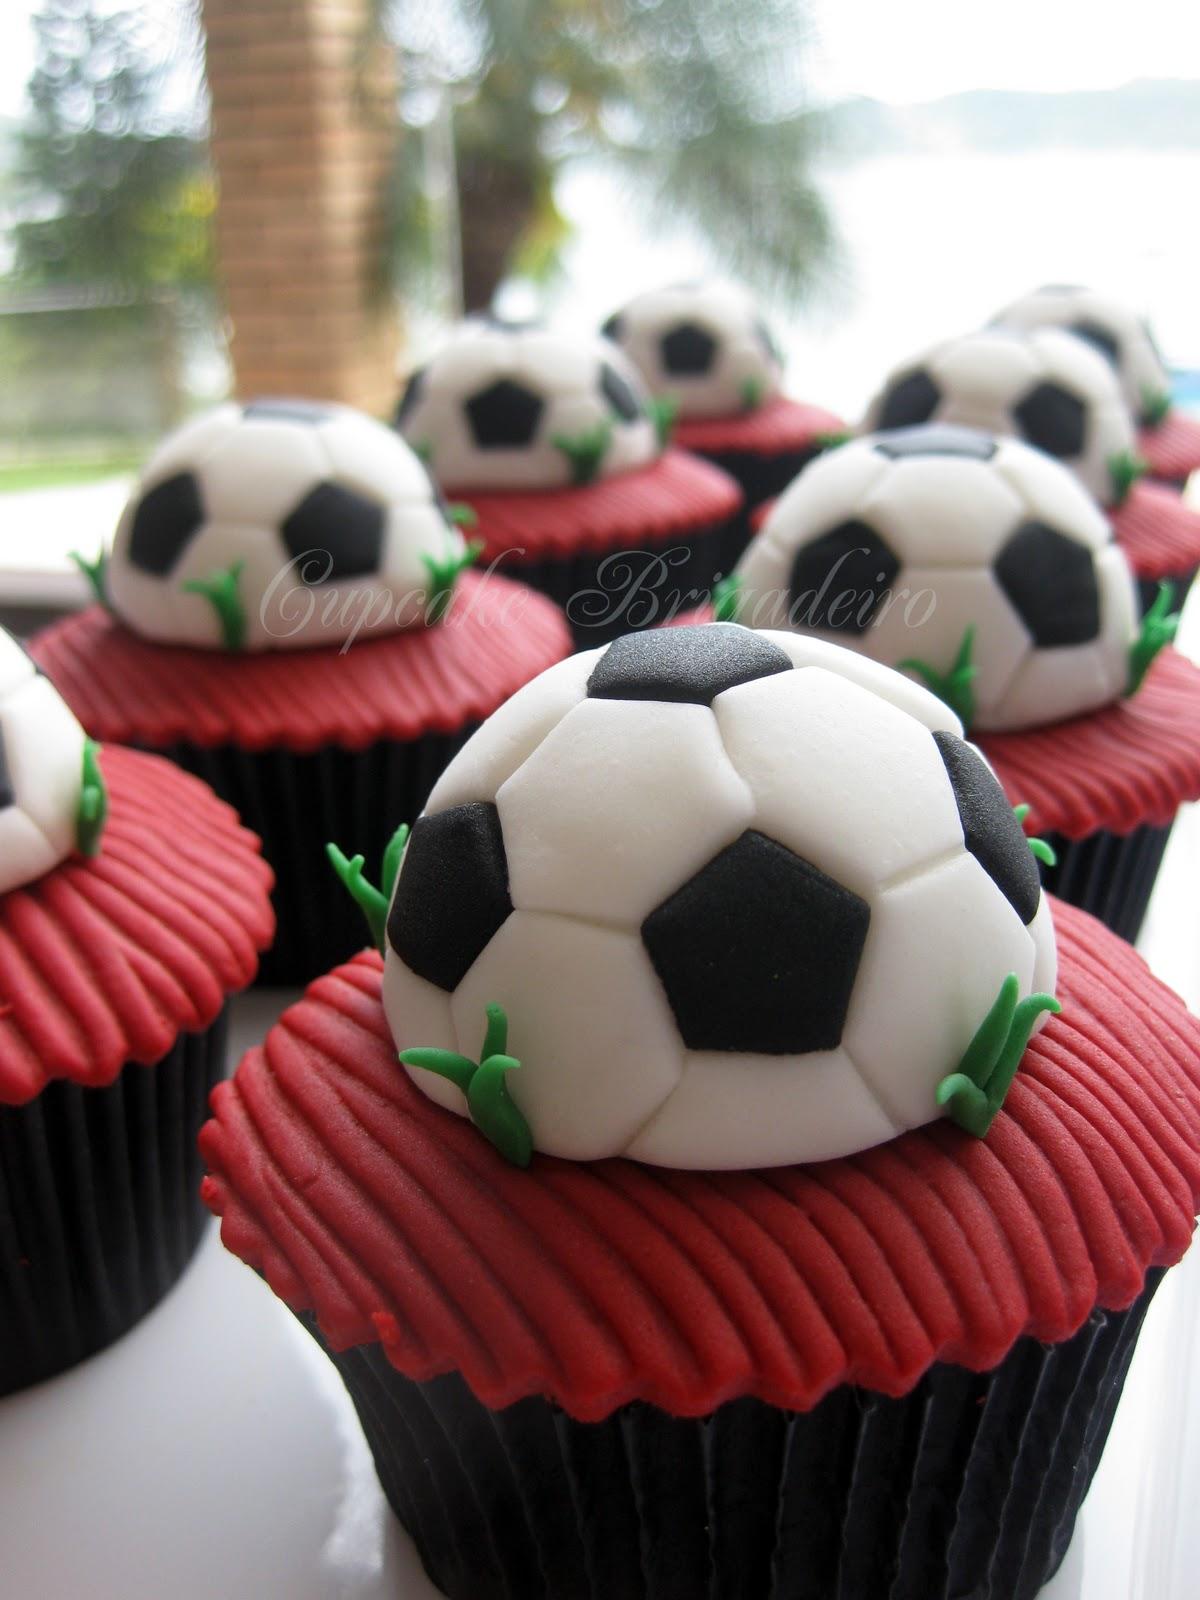 Cupcake Design For Birthdays : creative cupcake designs Cupcakes!